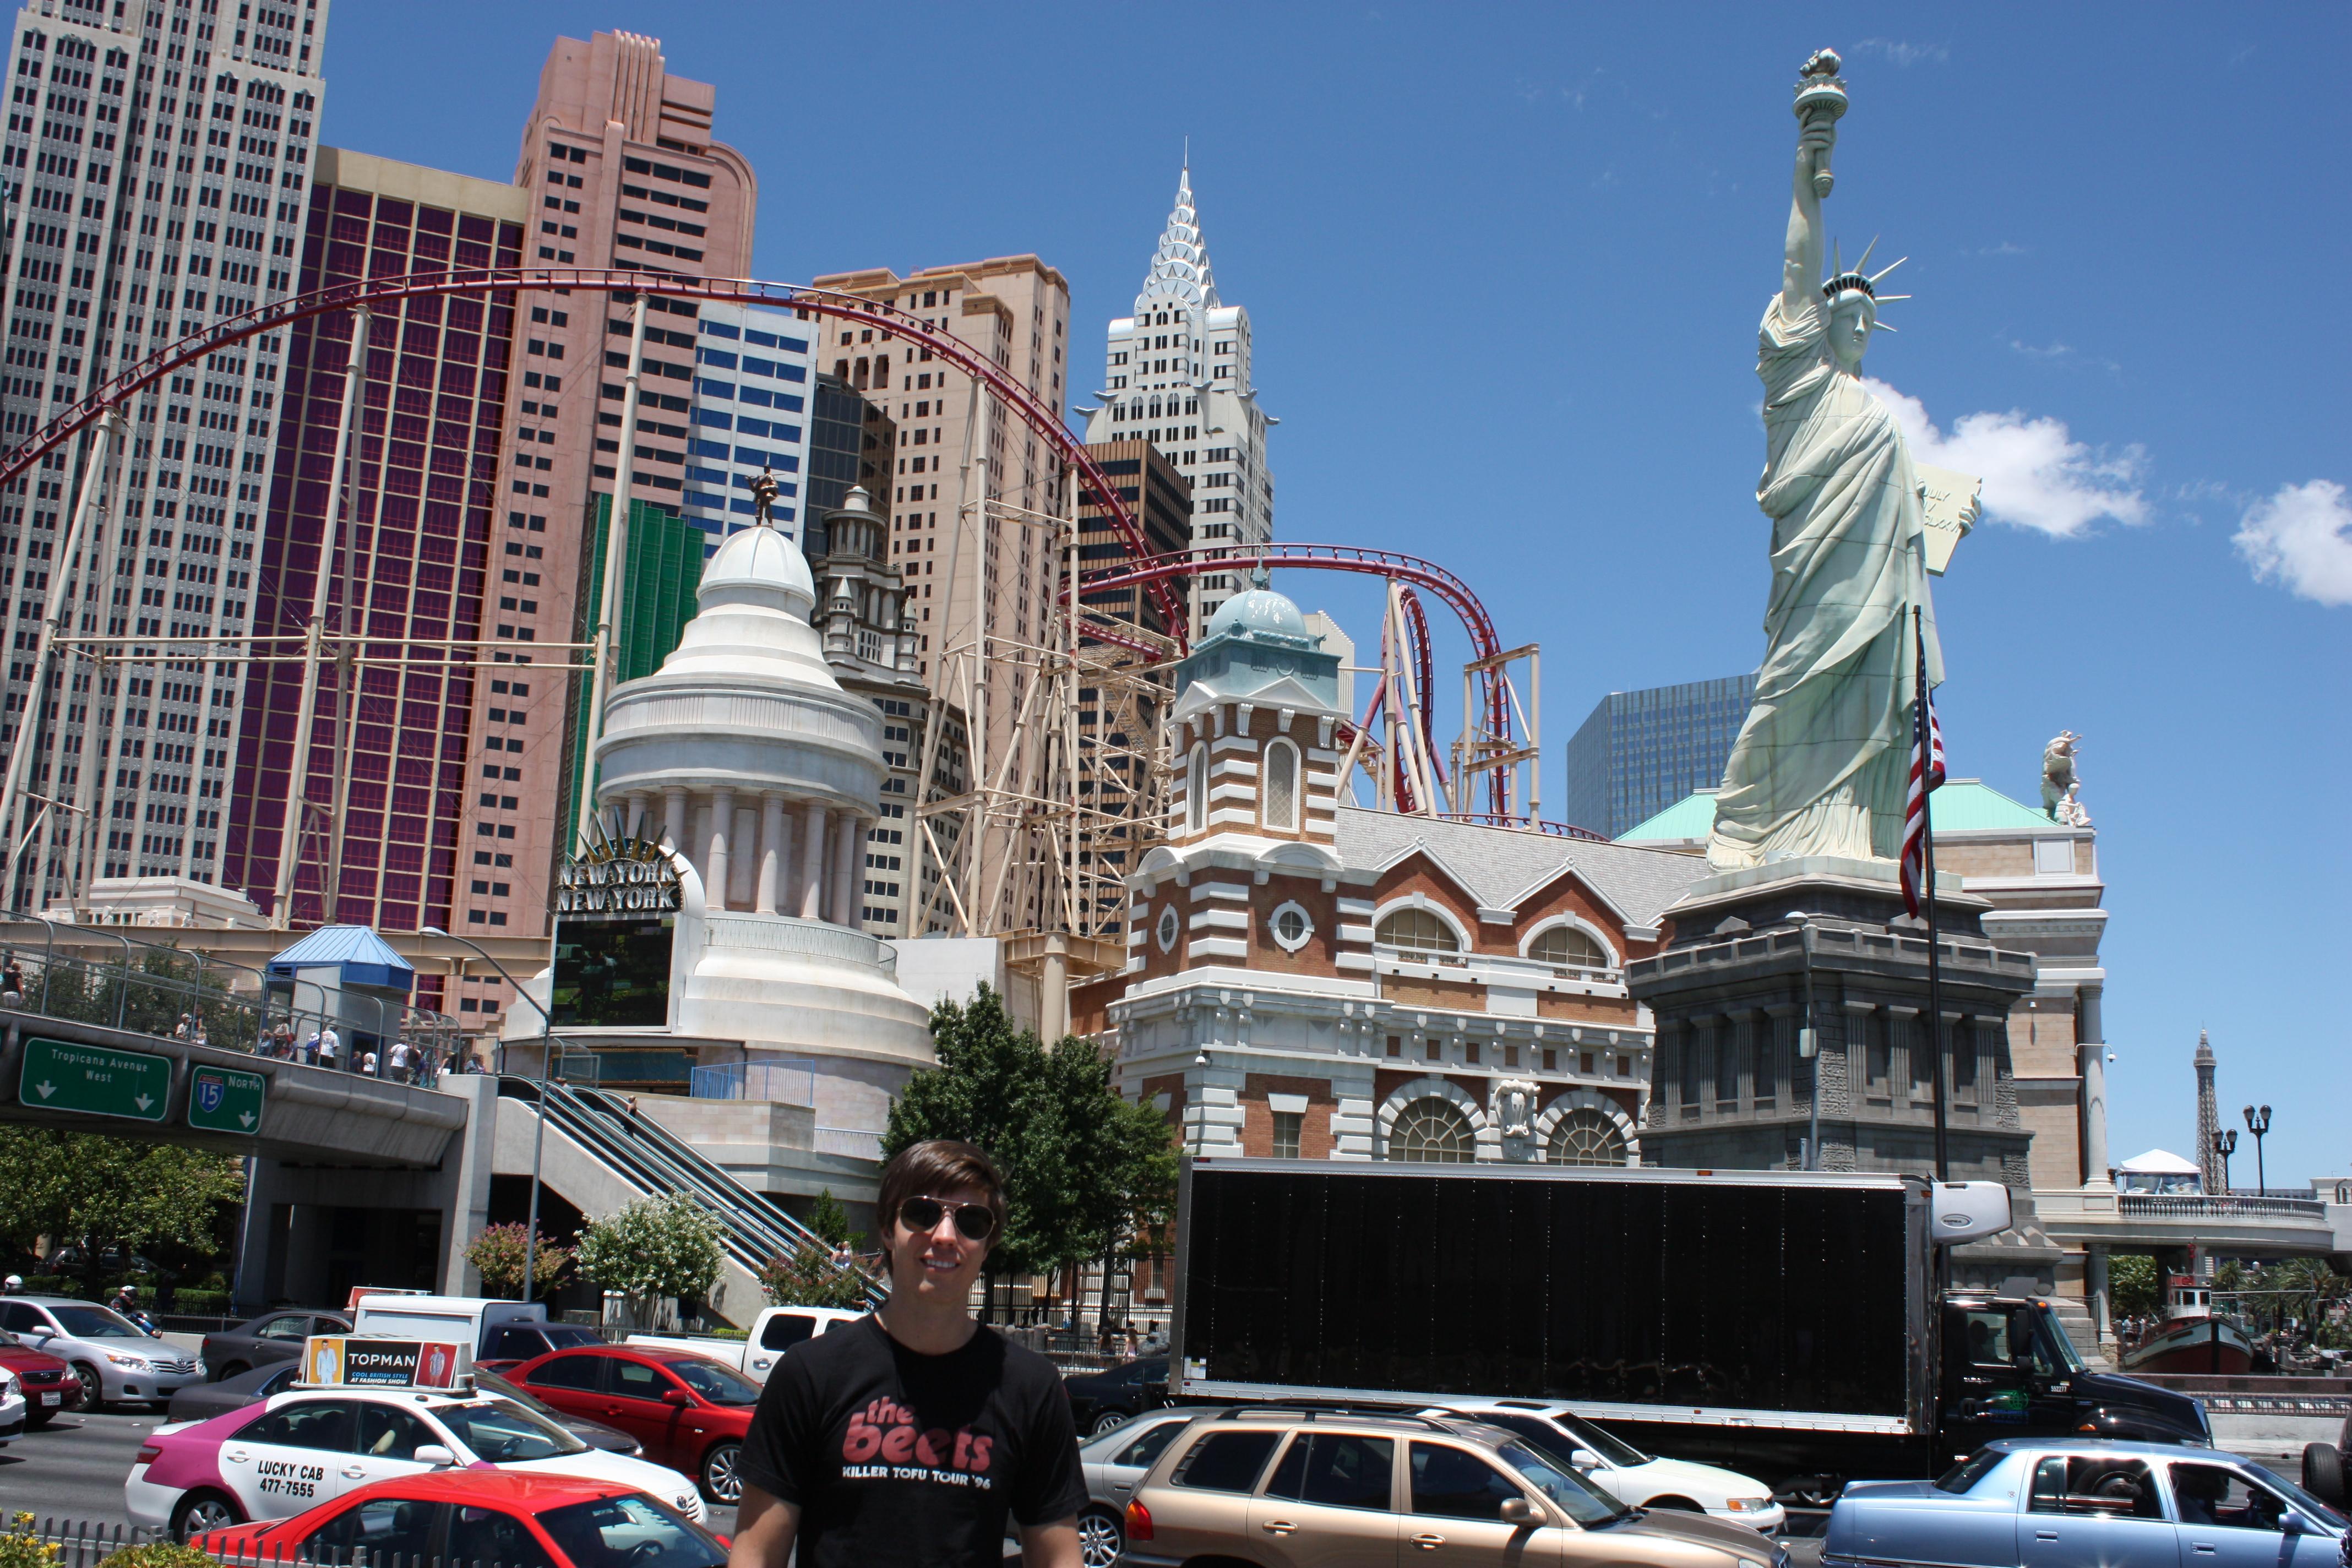 Cody Rapol and Keeshia McDonald in Vegas or somewhere close72